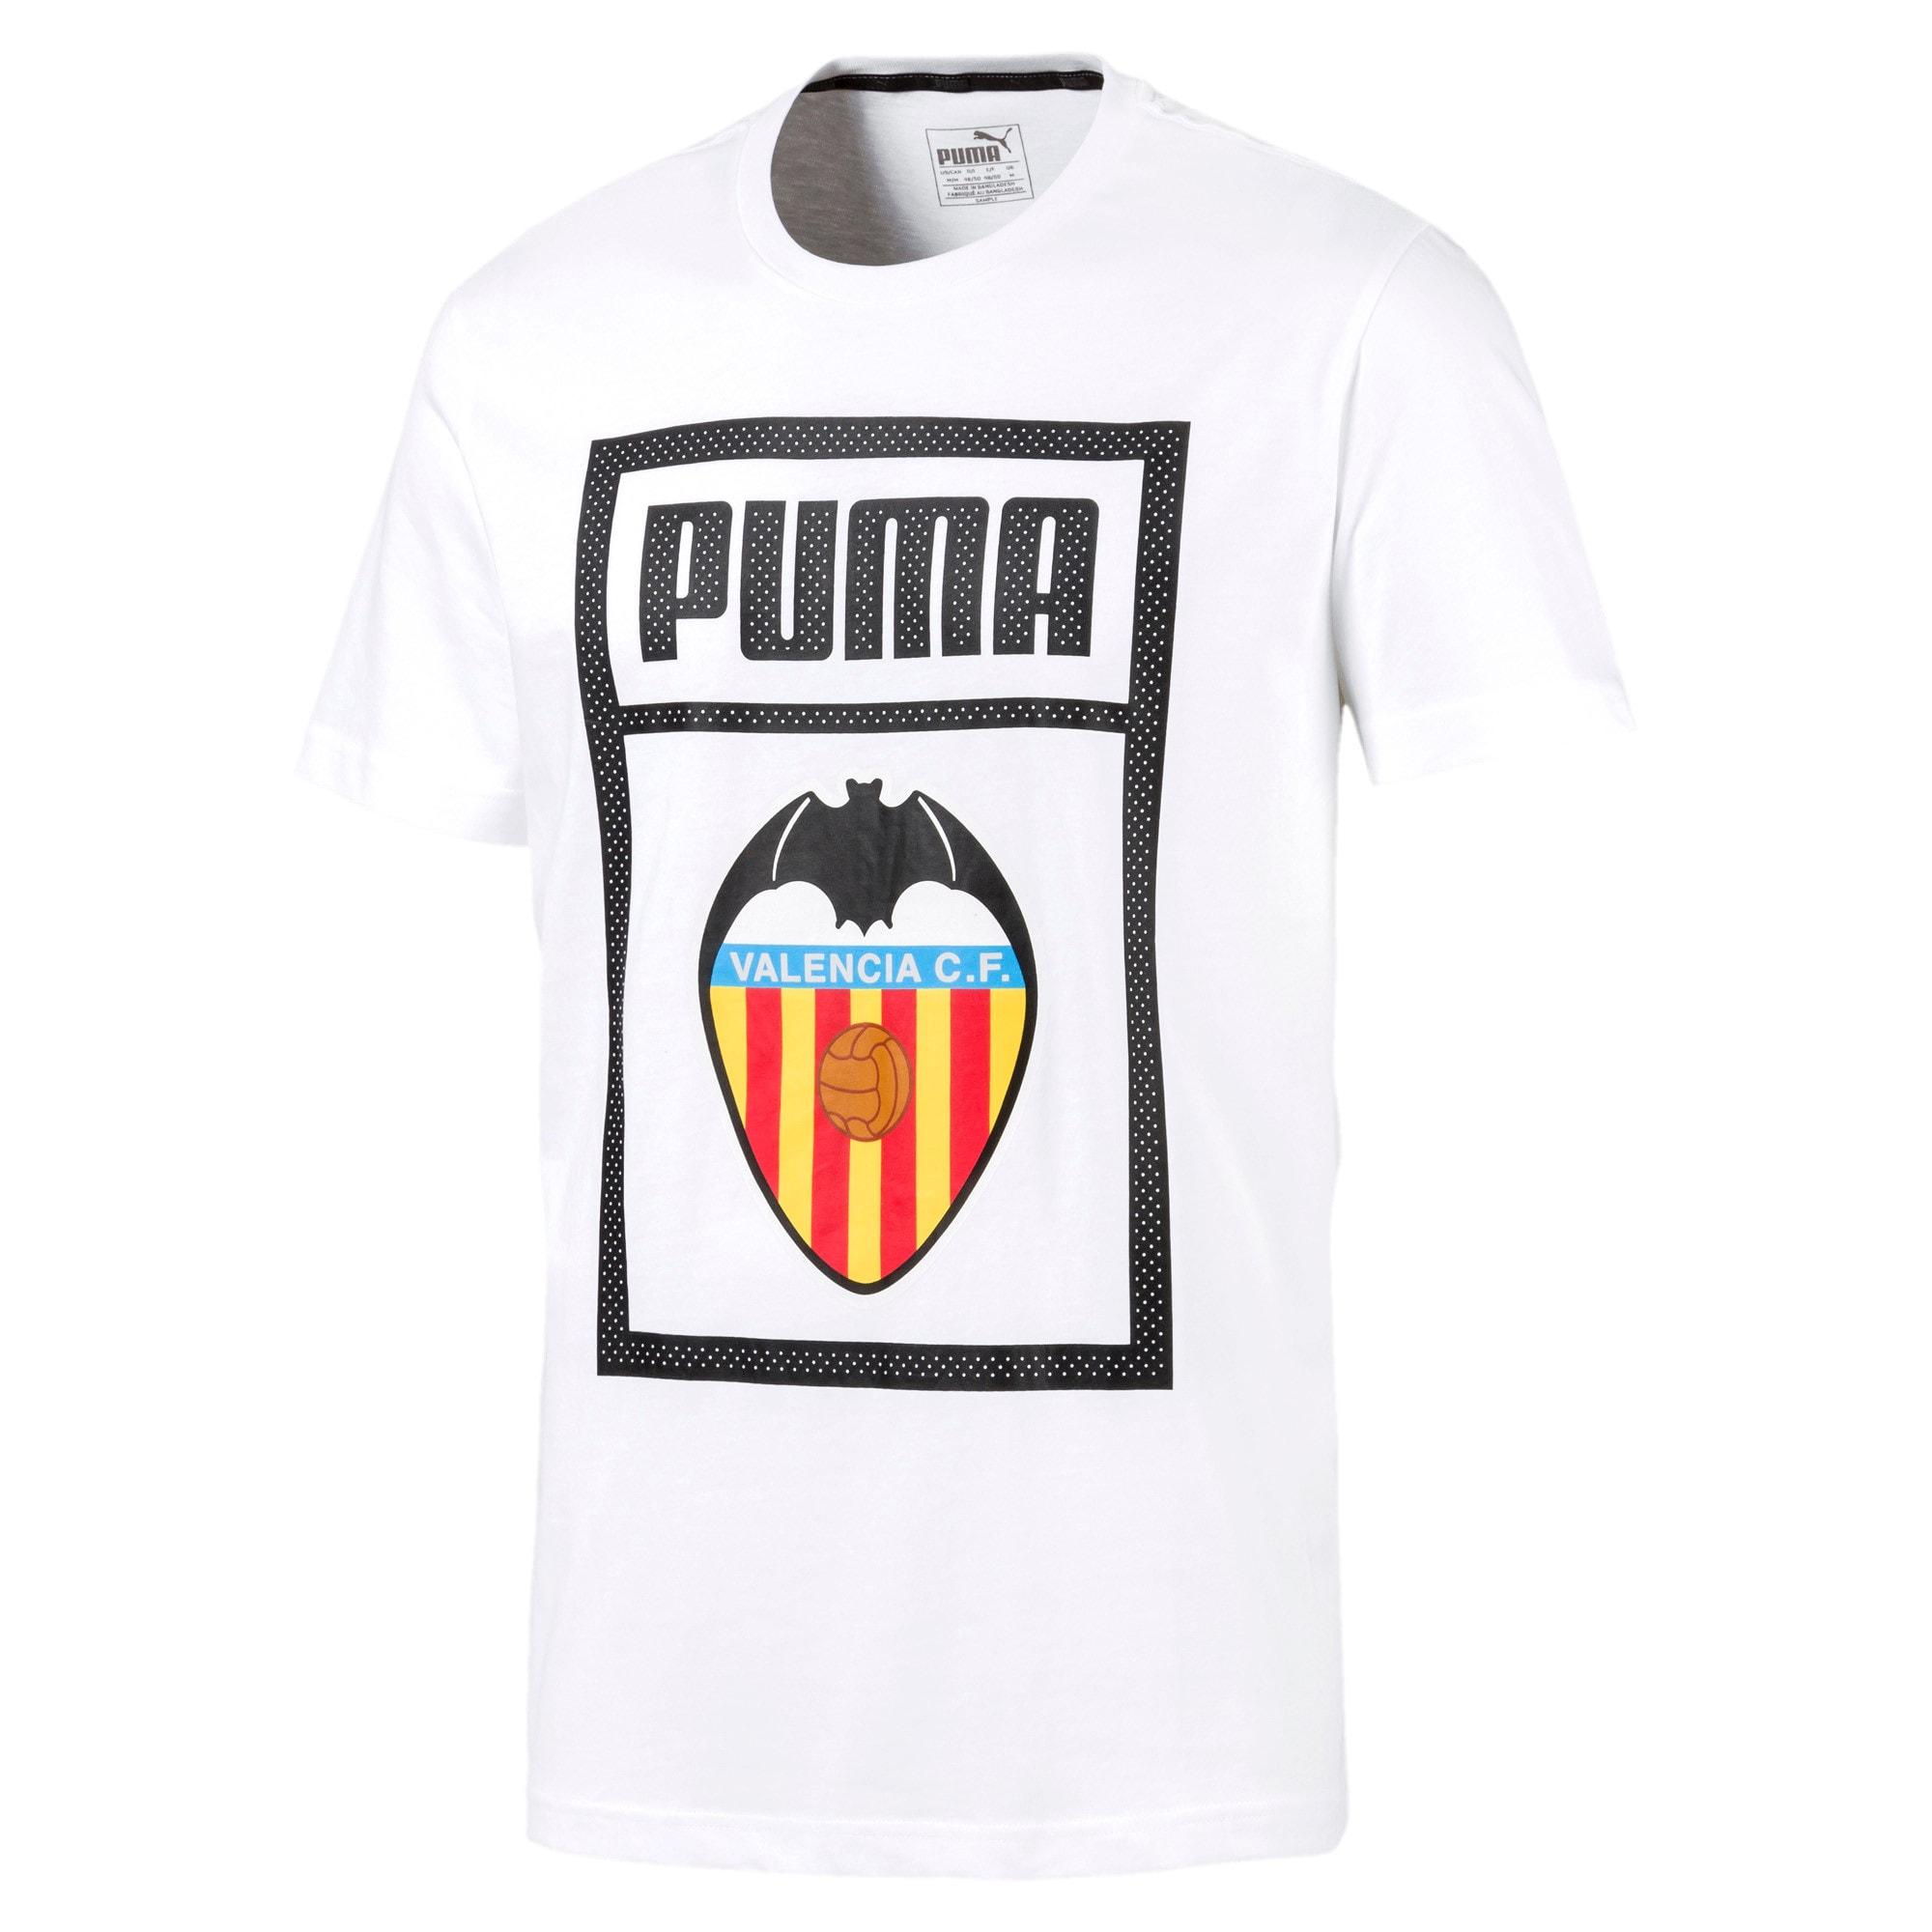 Thumbnail 1 of Valencia CF Shoe Tag Men's Tee, Puma White, medium